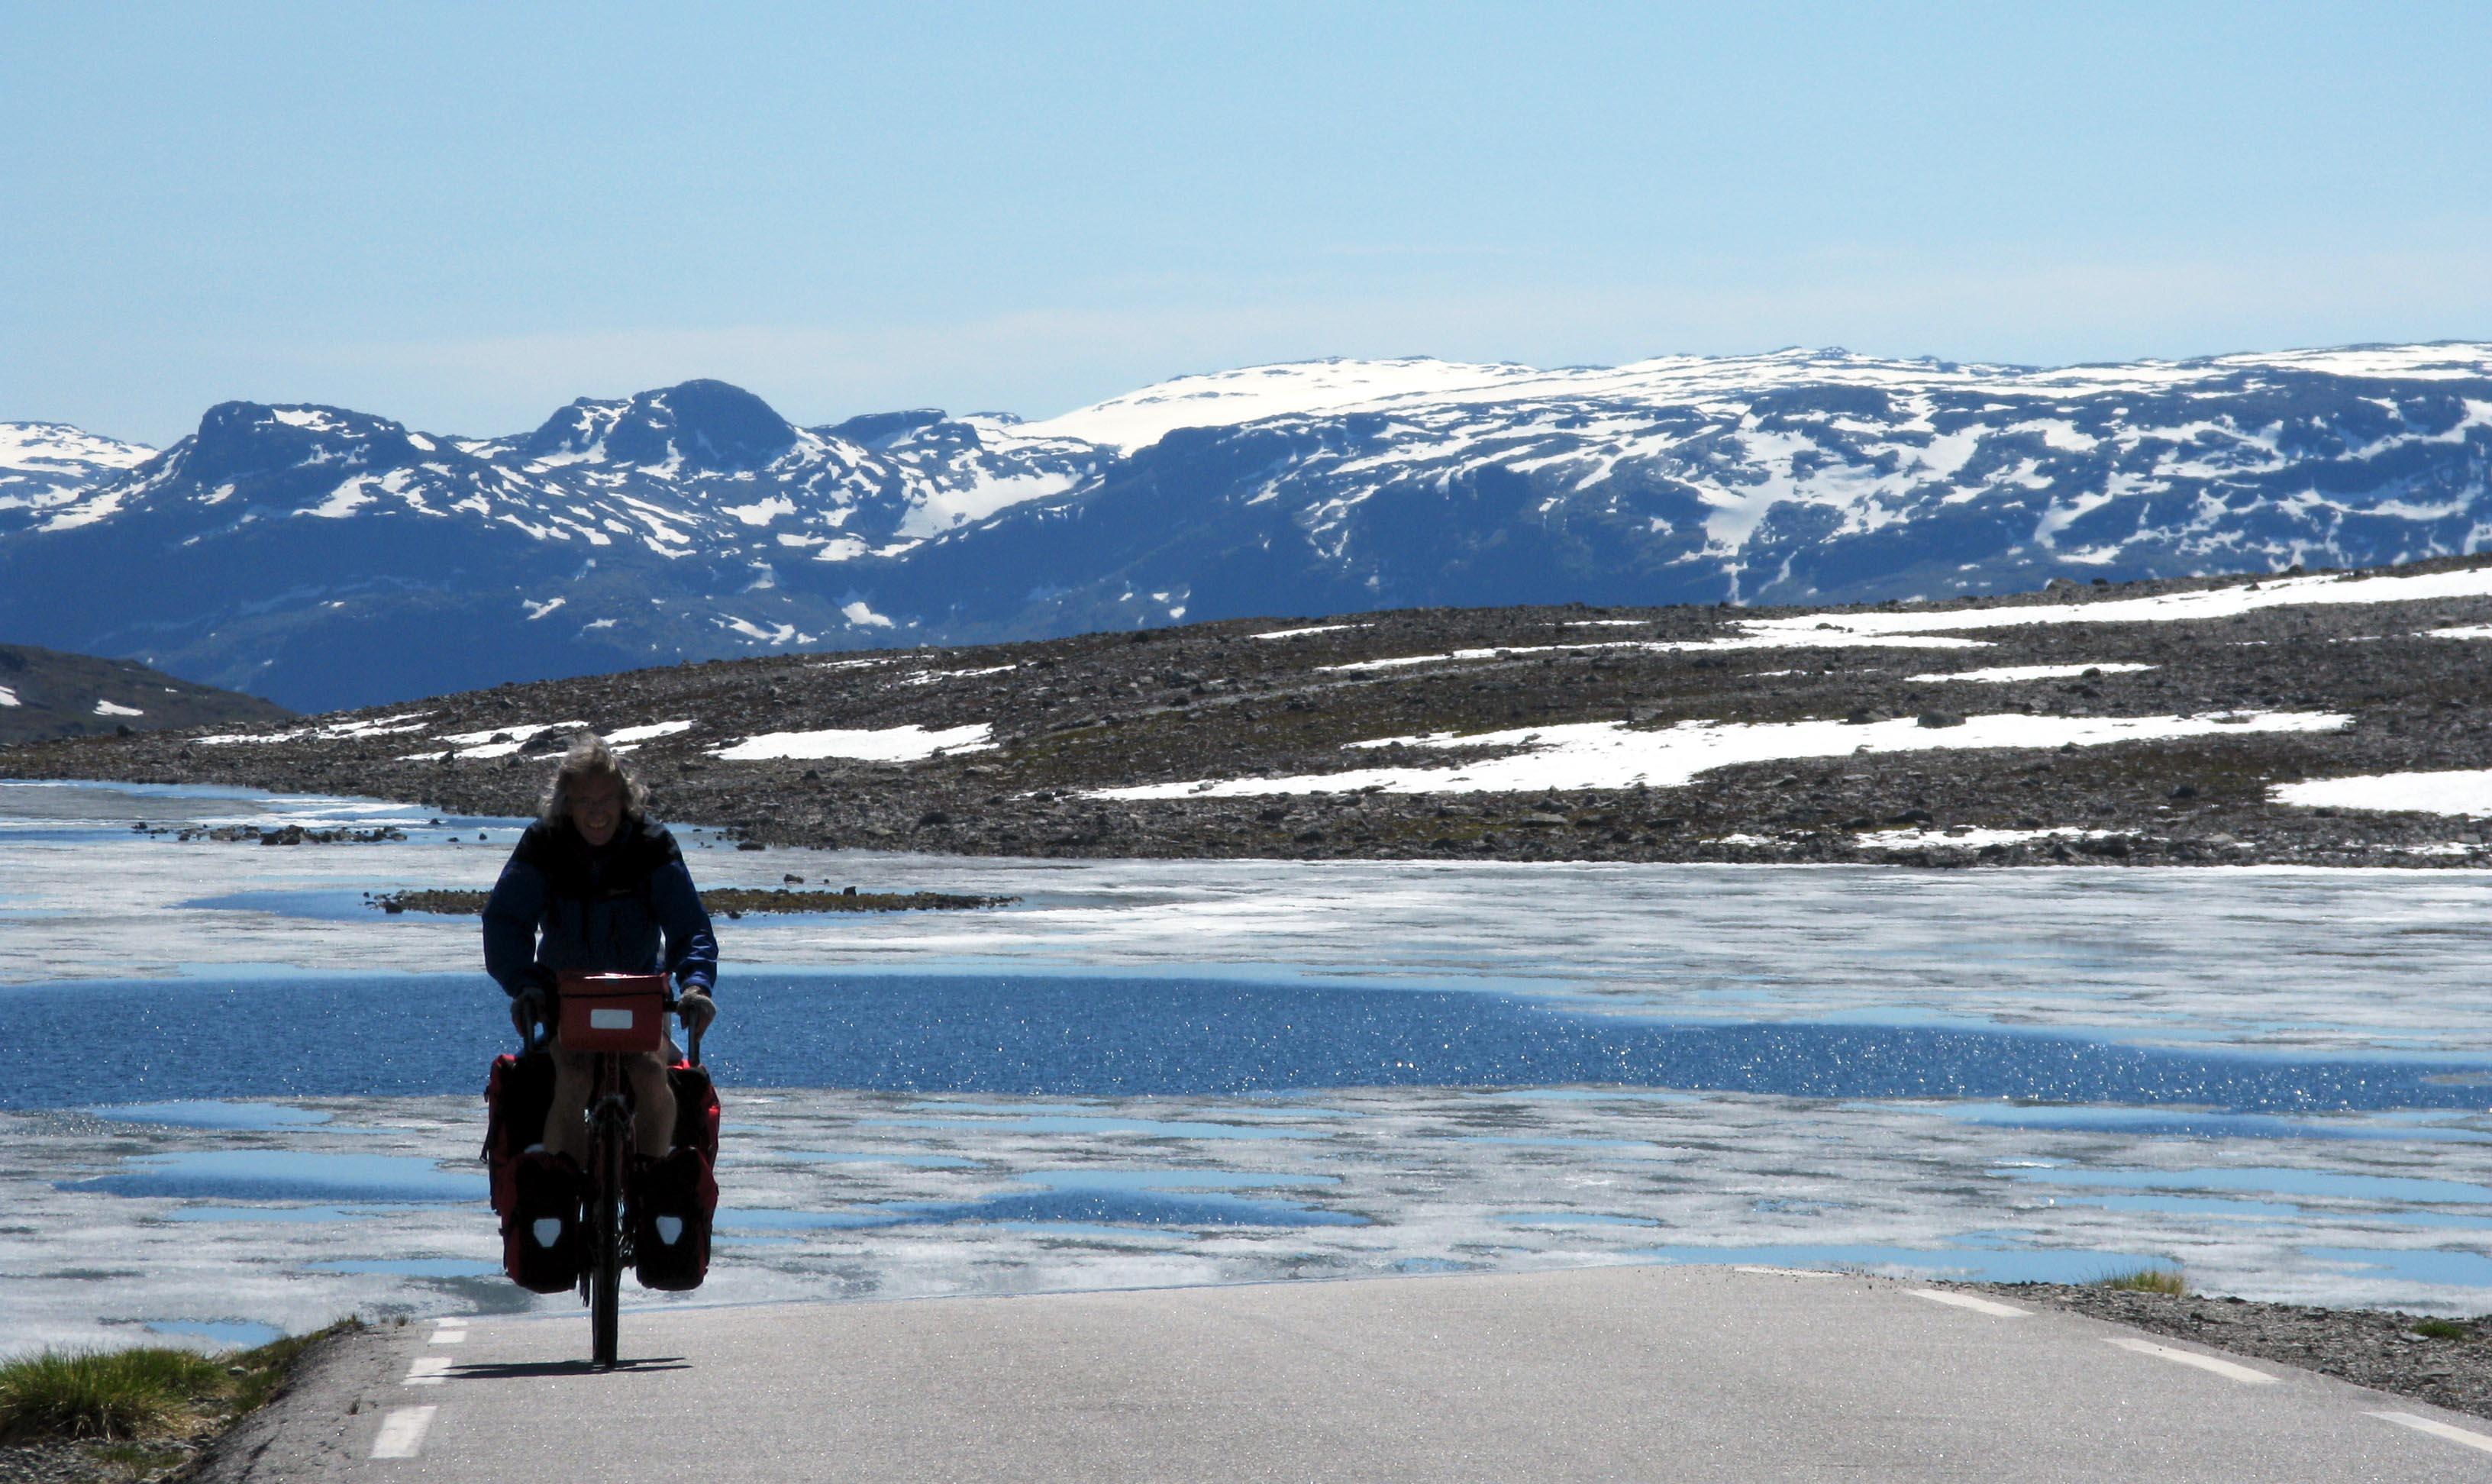 norwegen-wolfgang-horndalsvegen